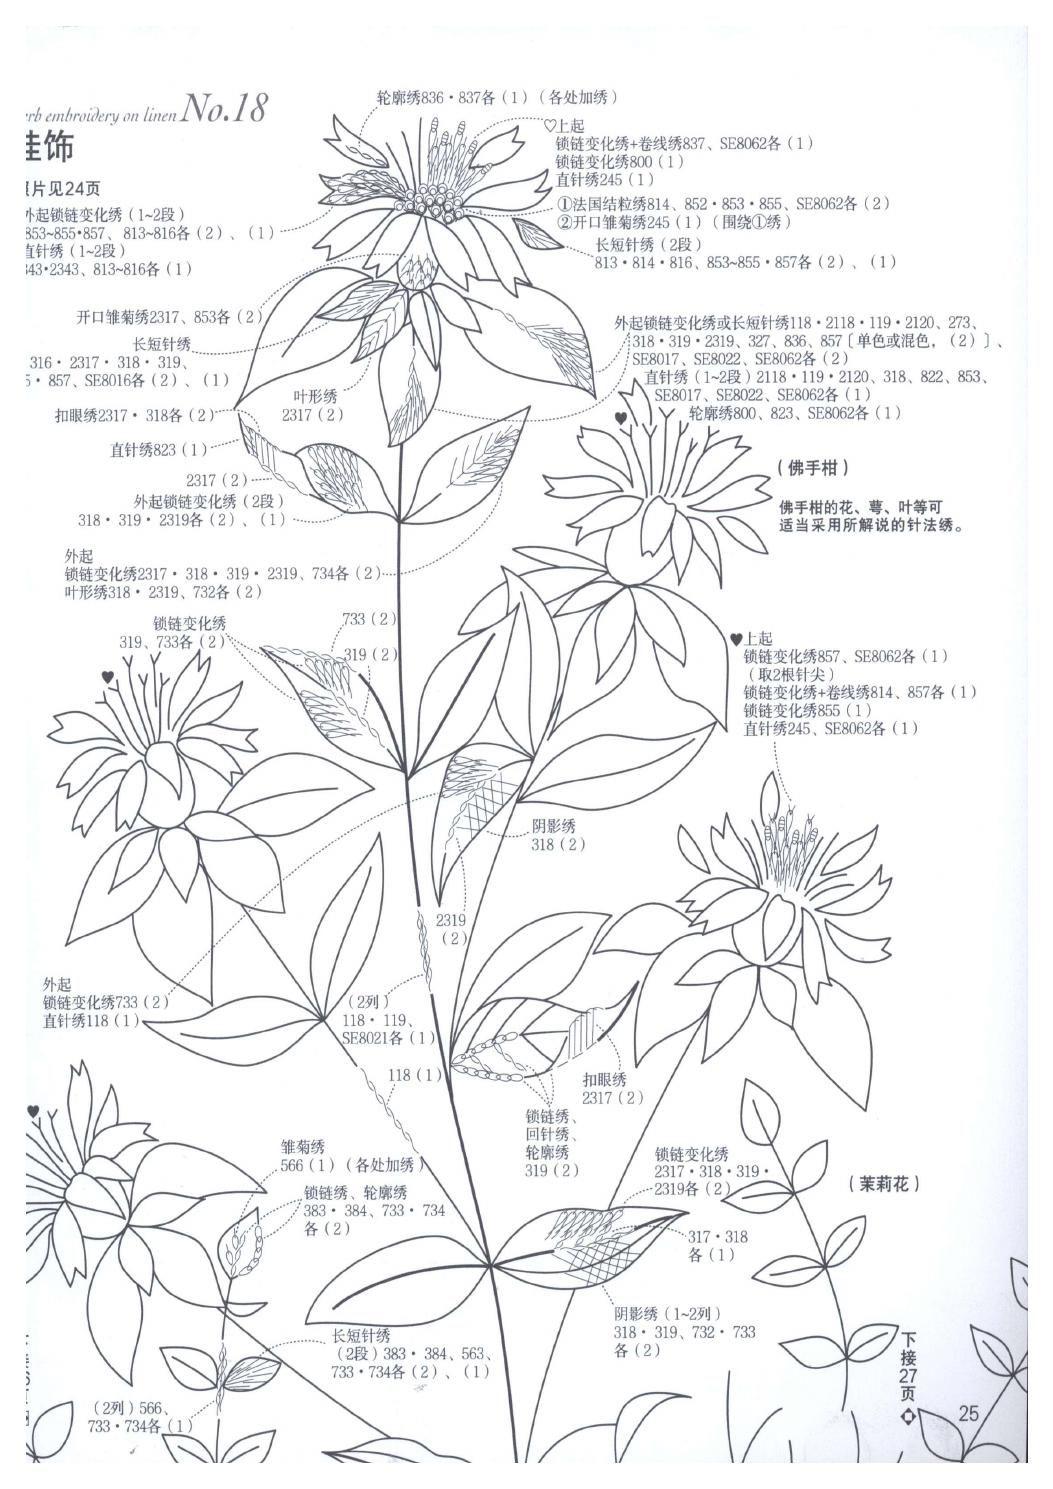 Emb0010 | Dibujo floral, Bordado japonés y Bordado